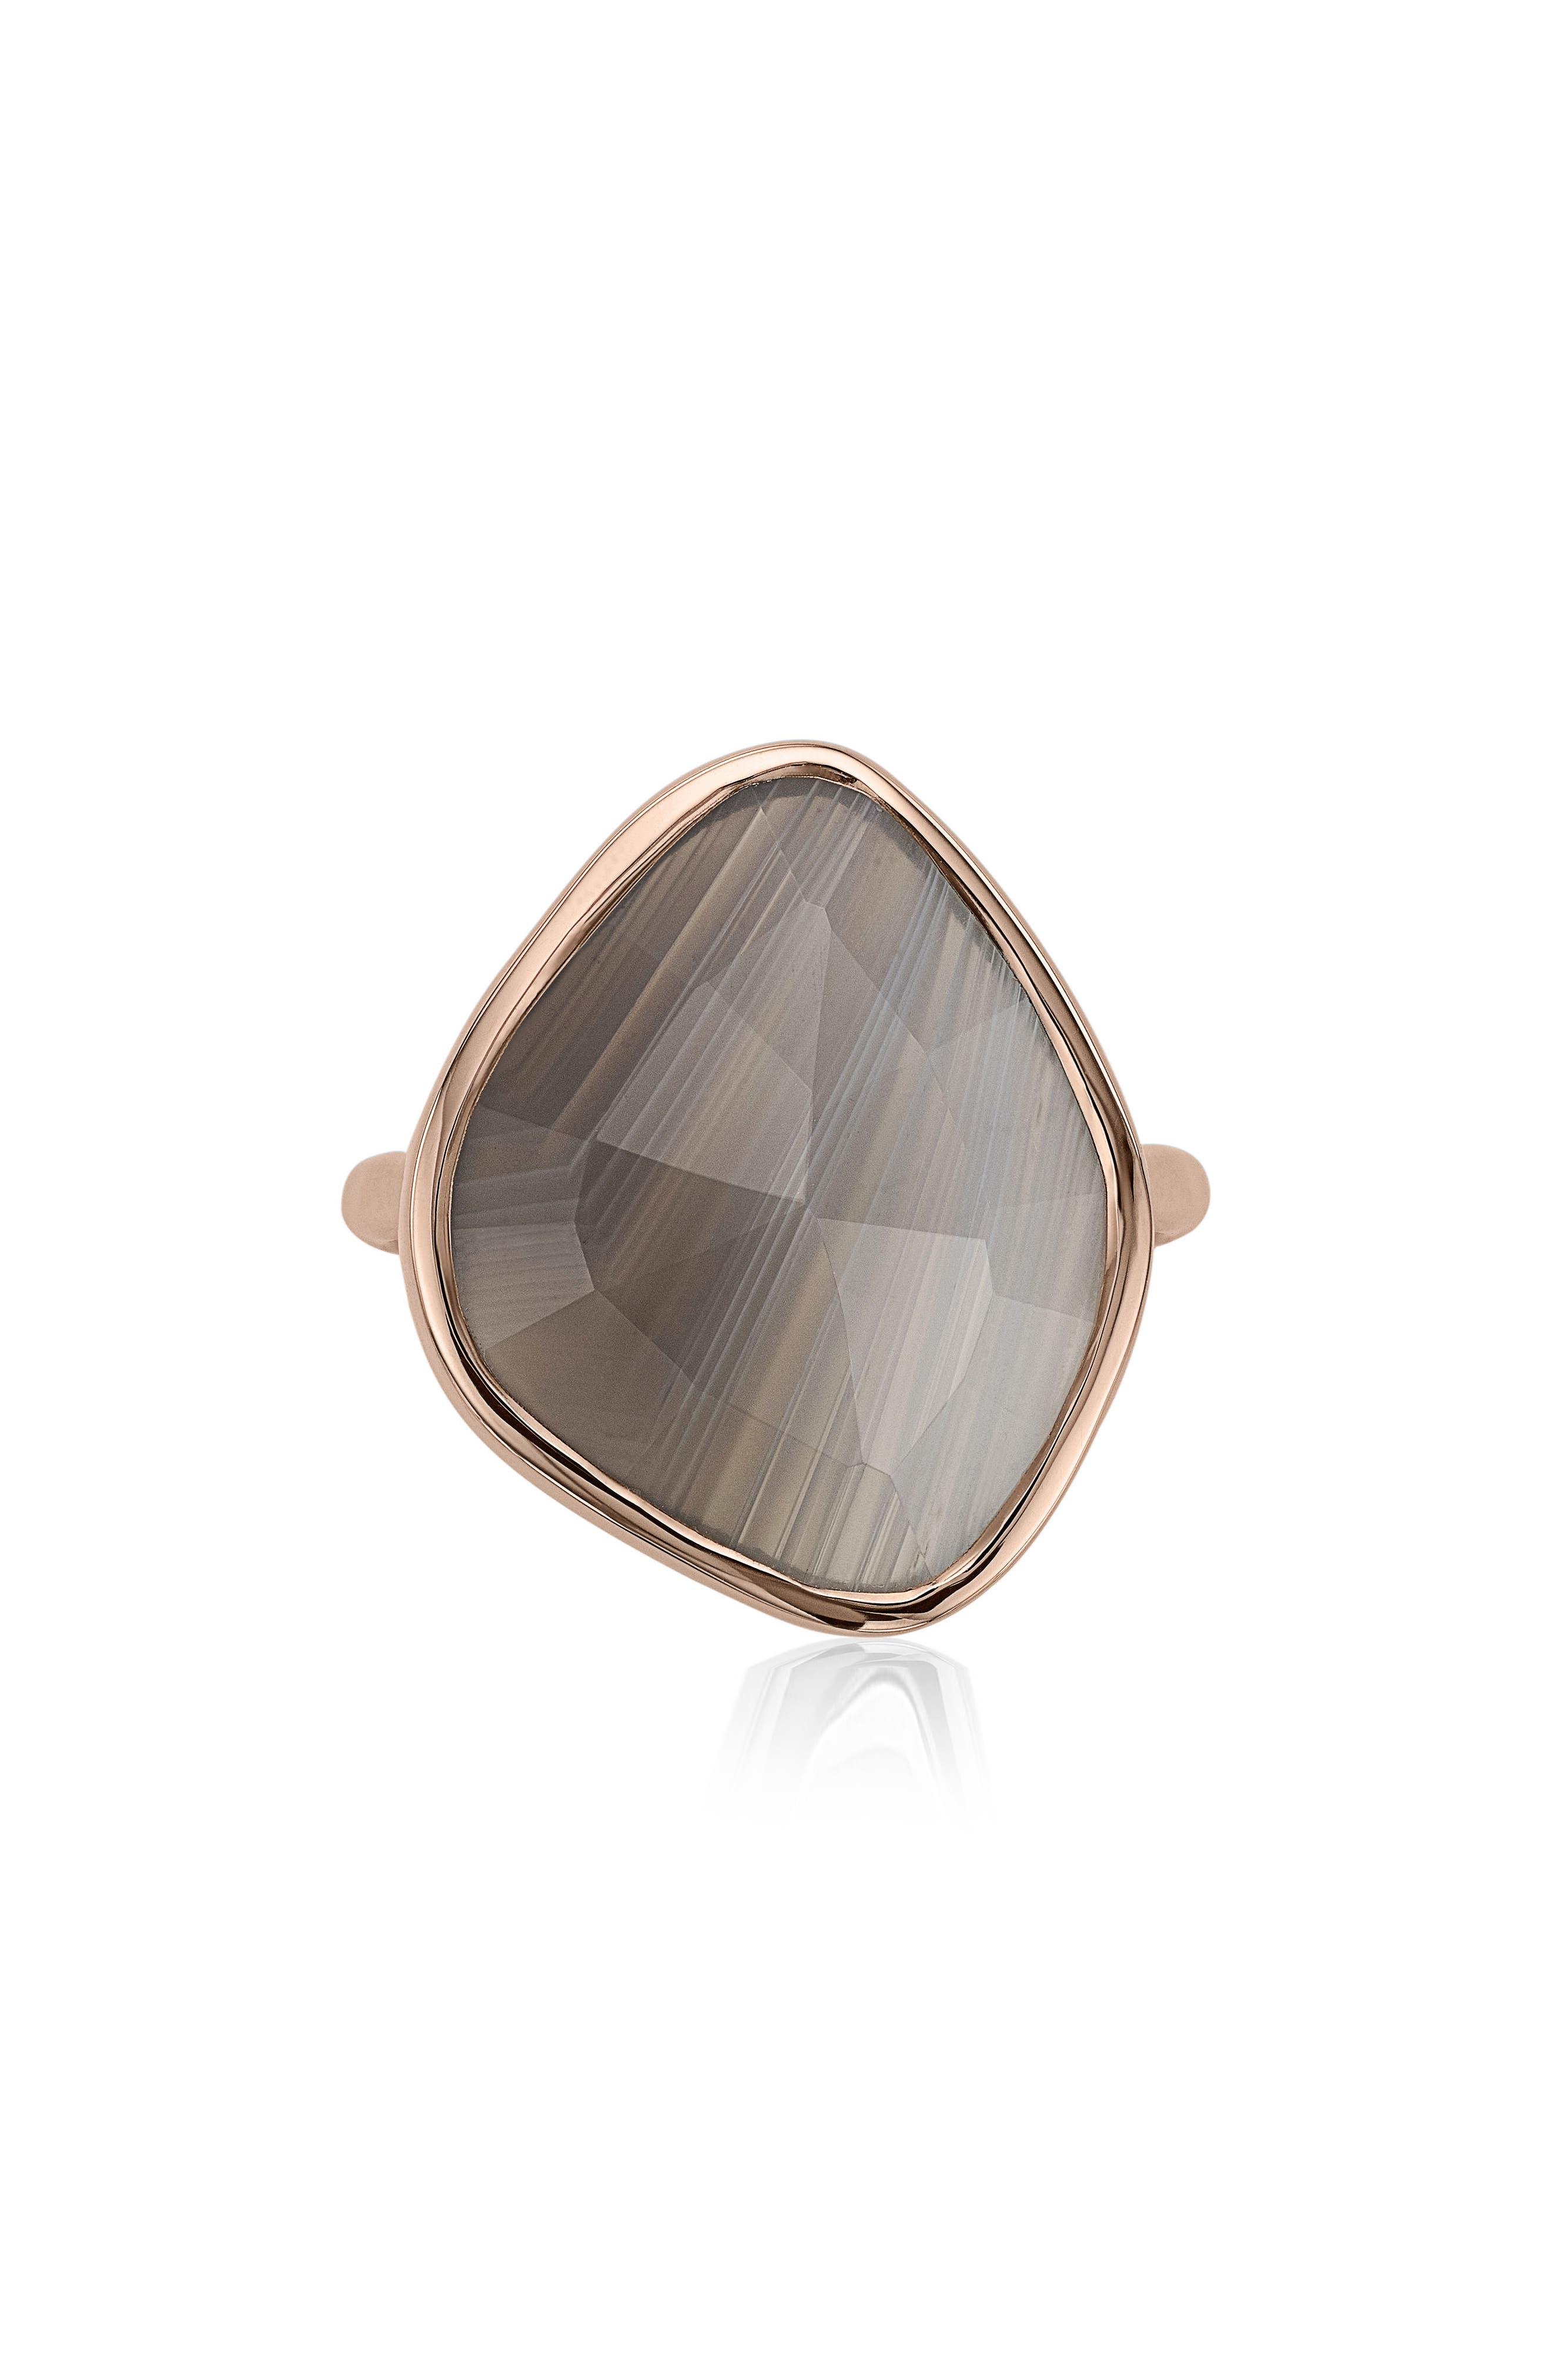 Siren Nugget Semiprecious Stone Ring,                             Main thumbnail 1, color,                             Grey Agate/ Rose Gold